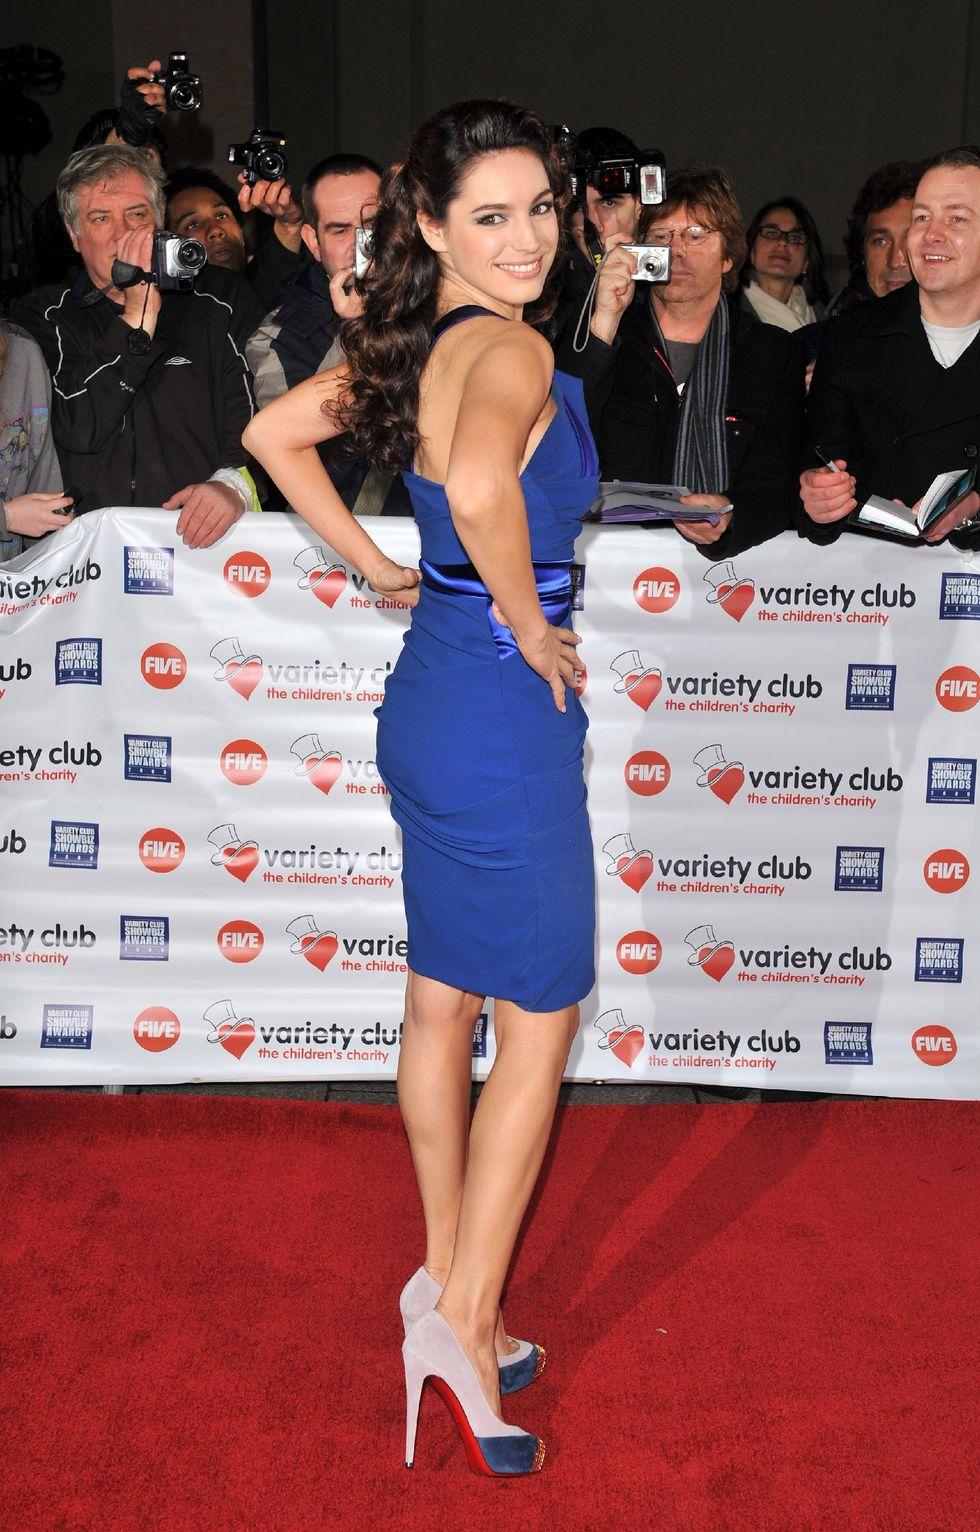 kelly-brook-57th-variety-club-showbiz-awards-2009-in-london-01